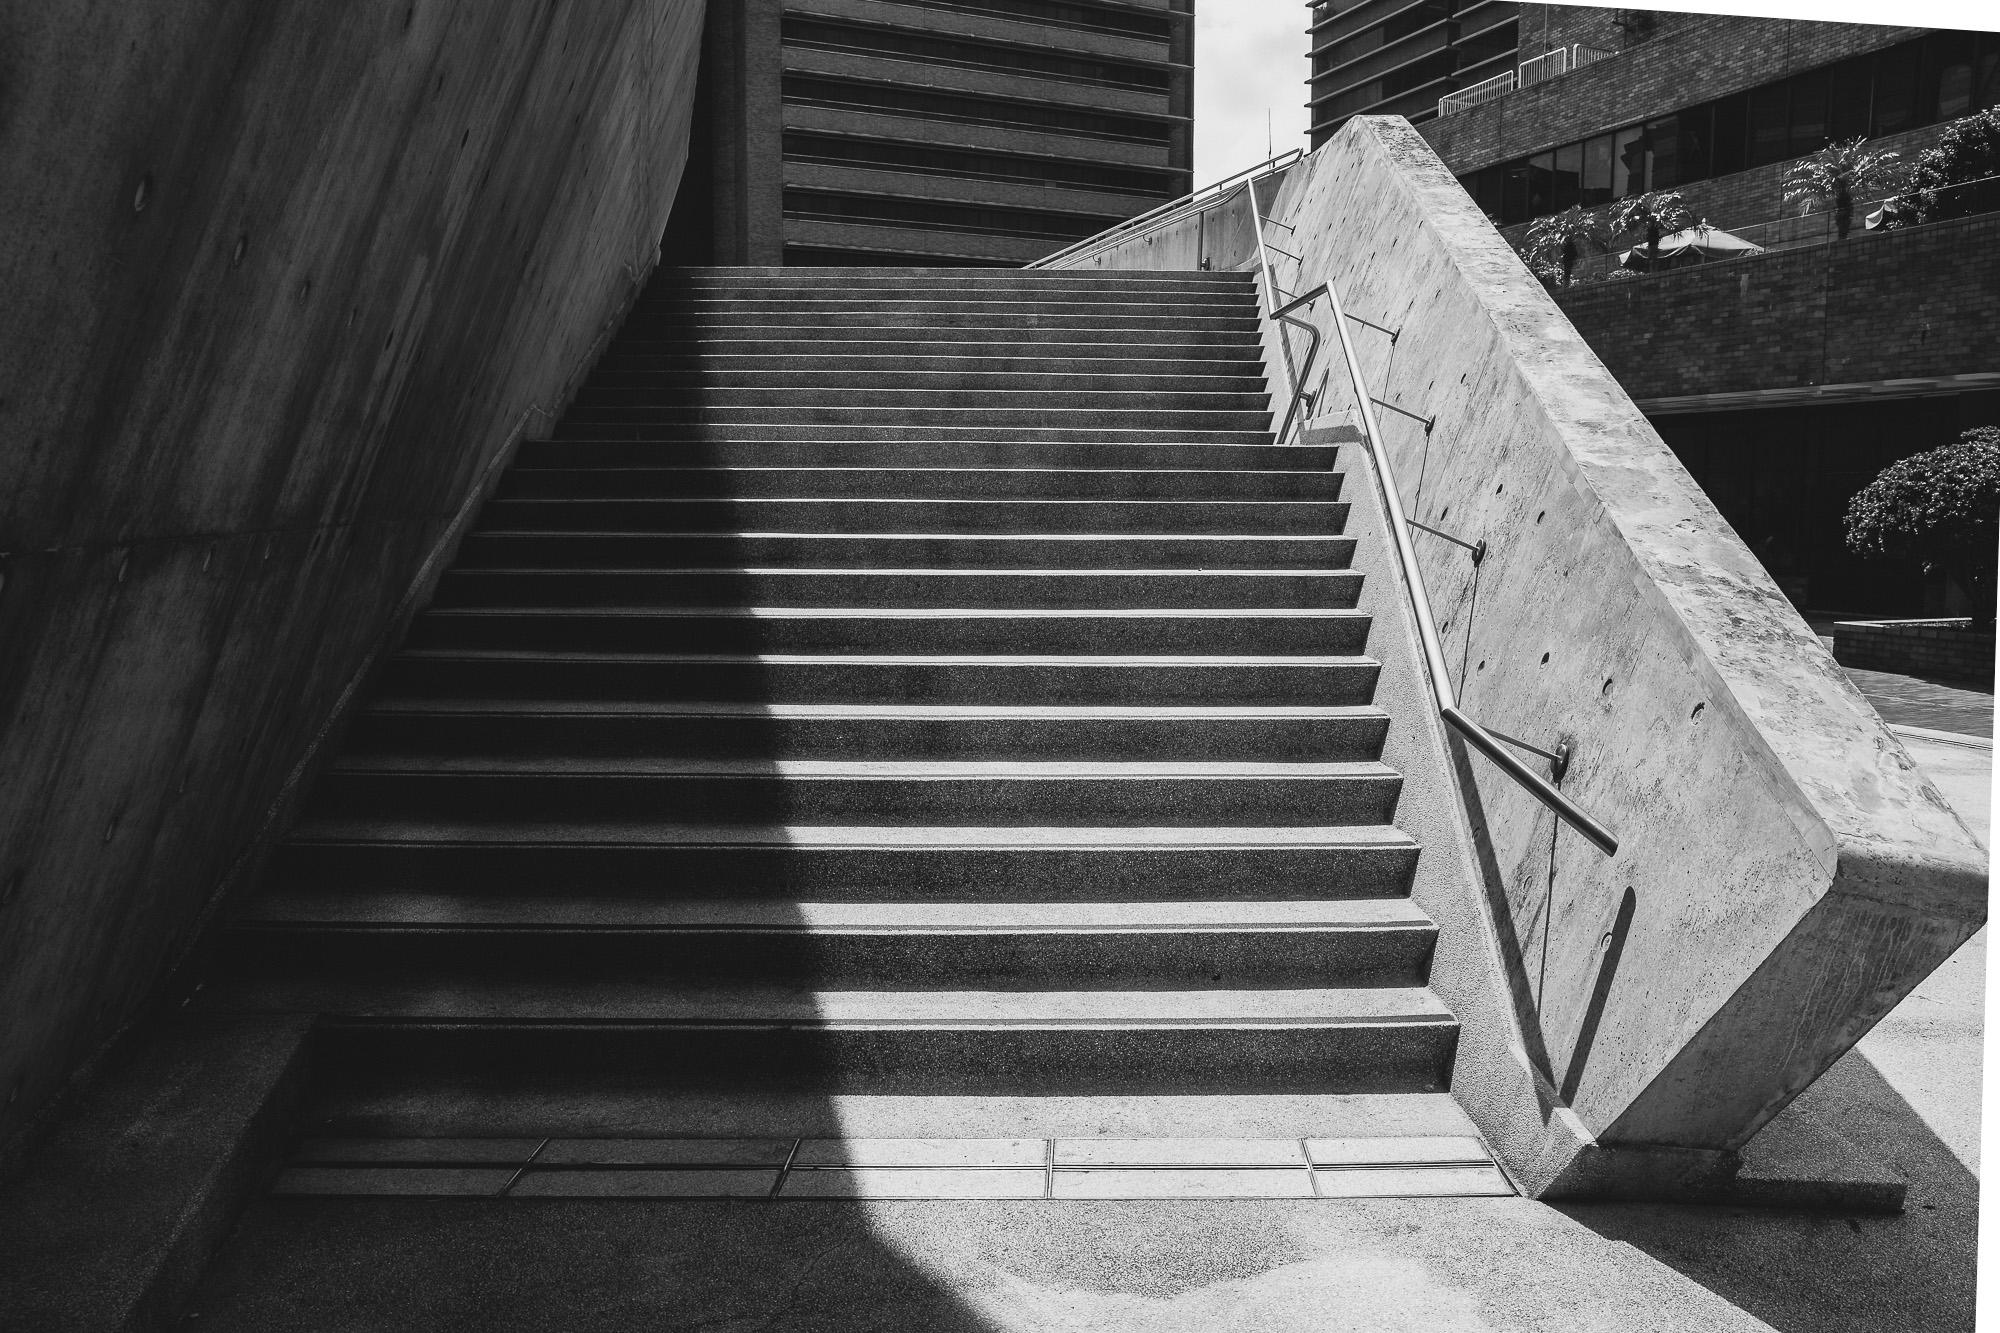 HK Architecture-0397.jpg